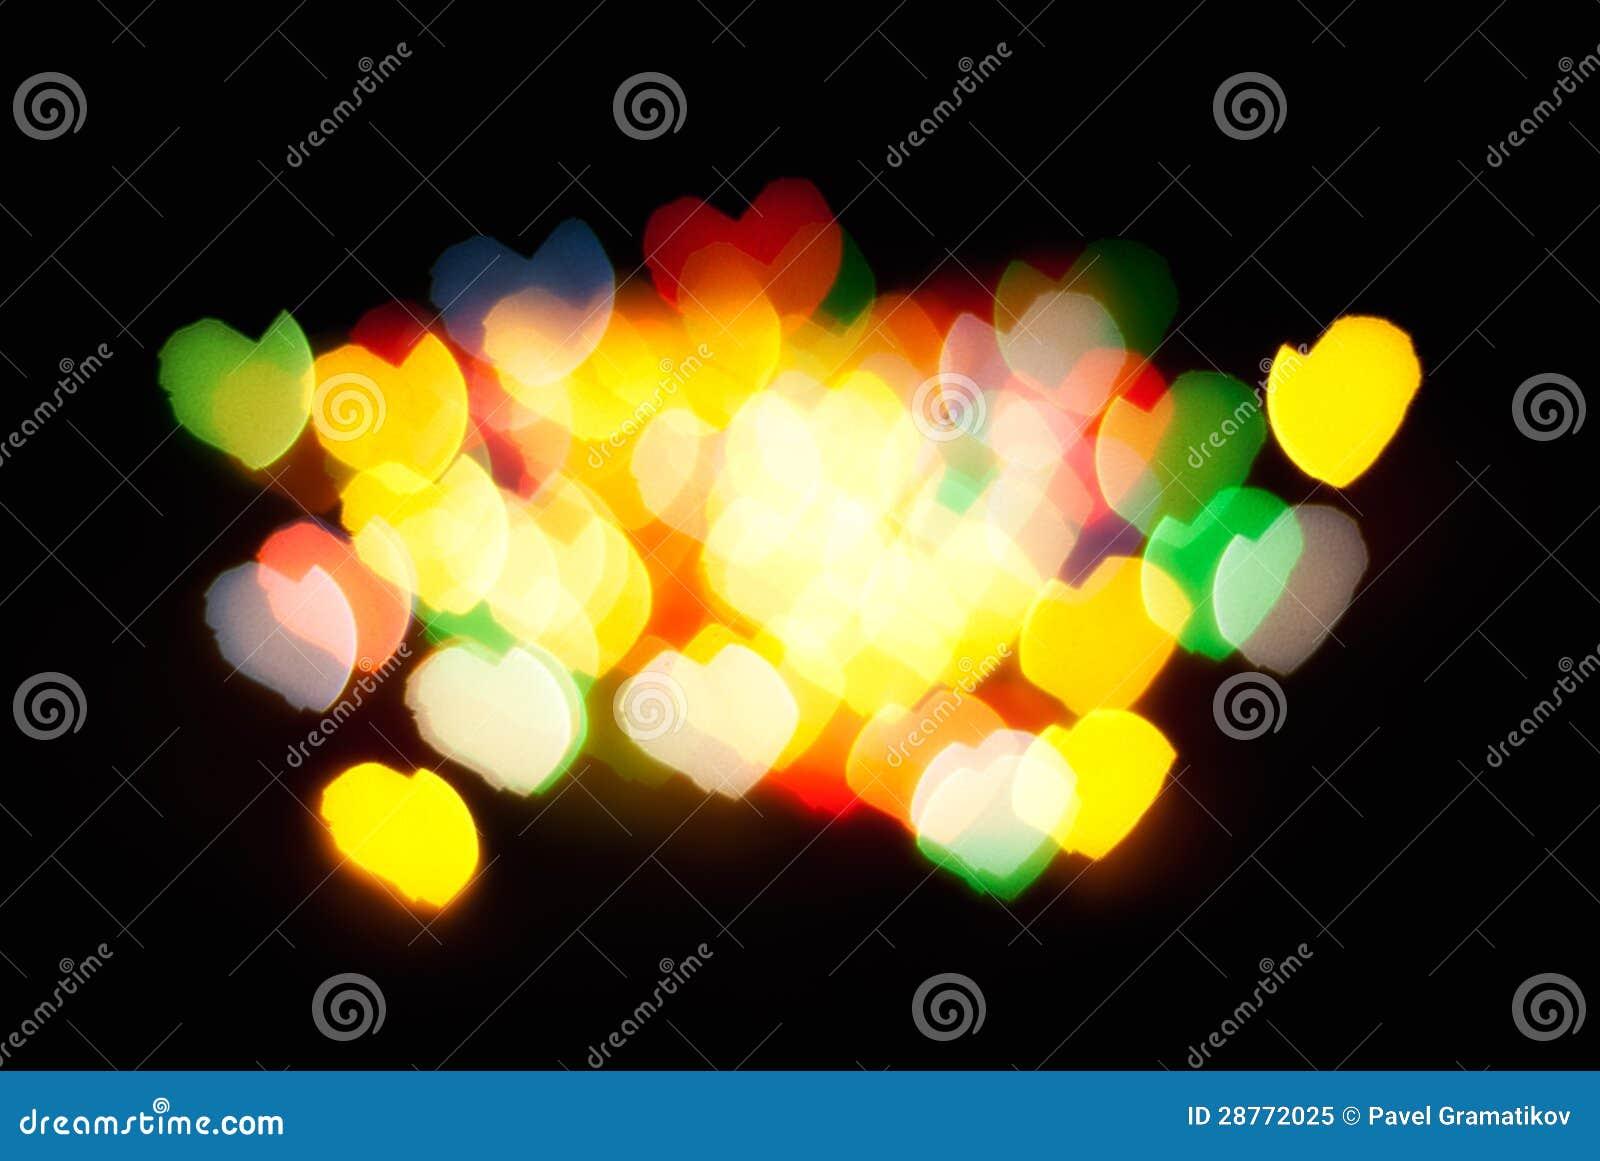 Абстрактные света сердца